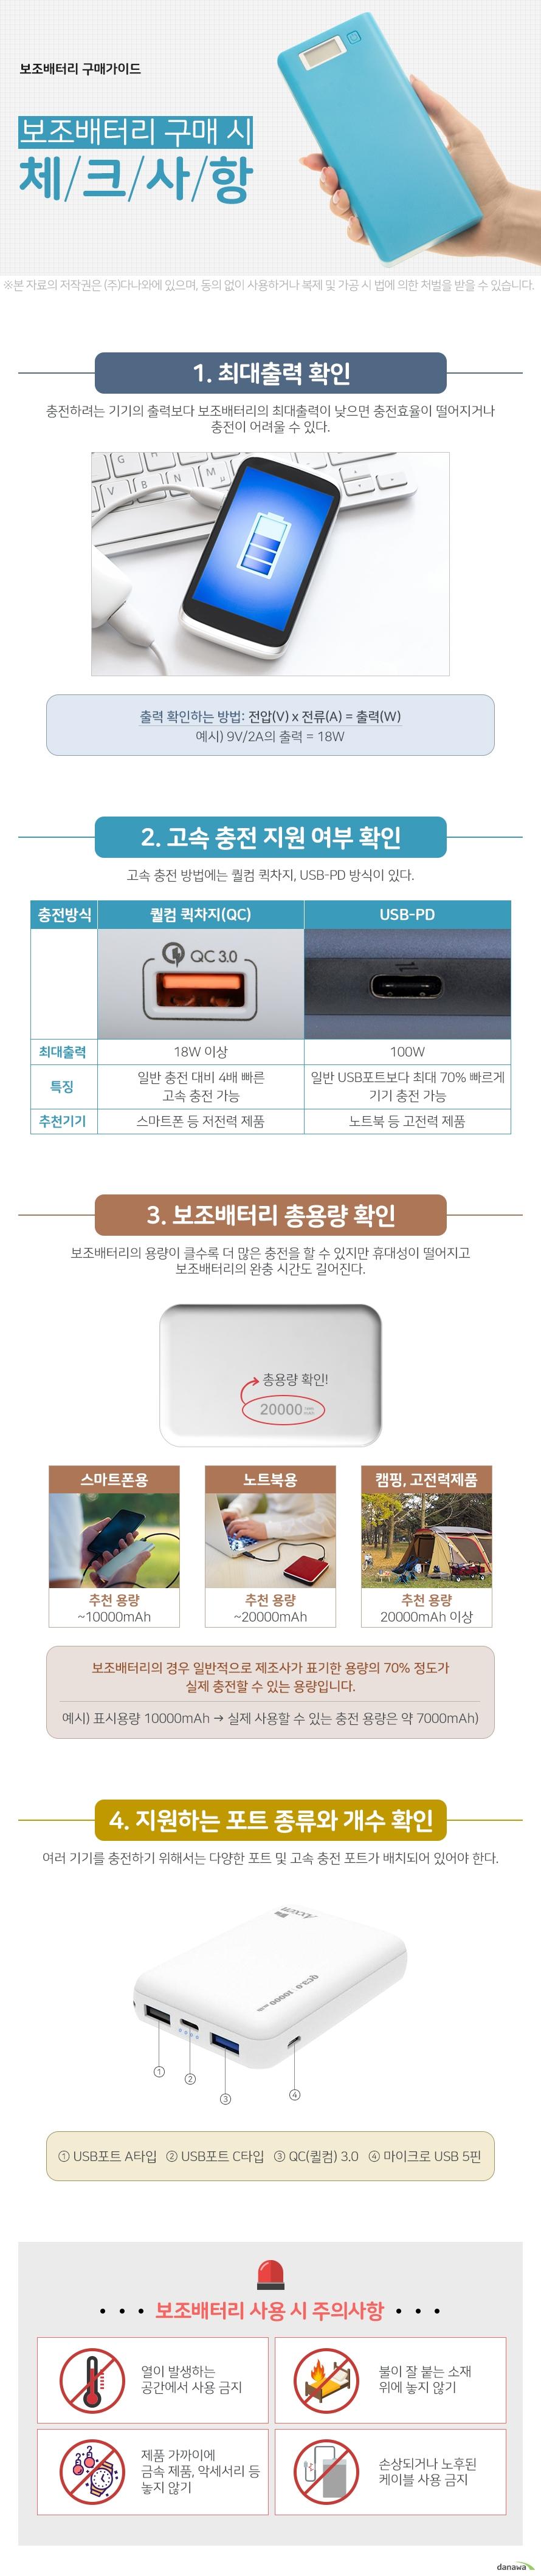 PLEOMAX 2포트 보조배터리 PMPB-20000 20000mAh (정품)